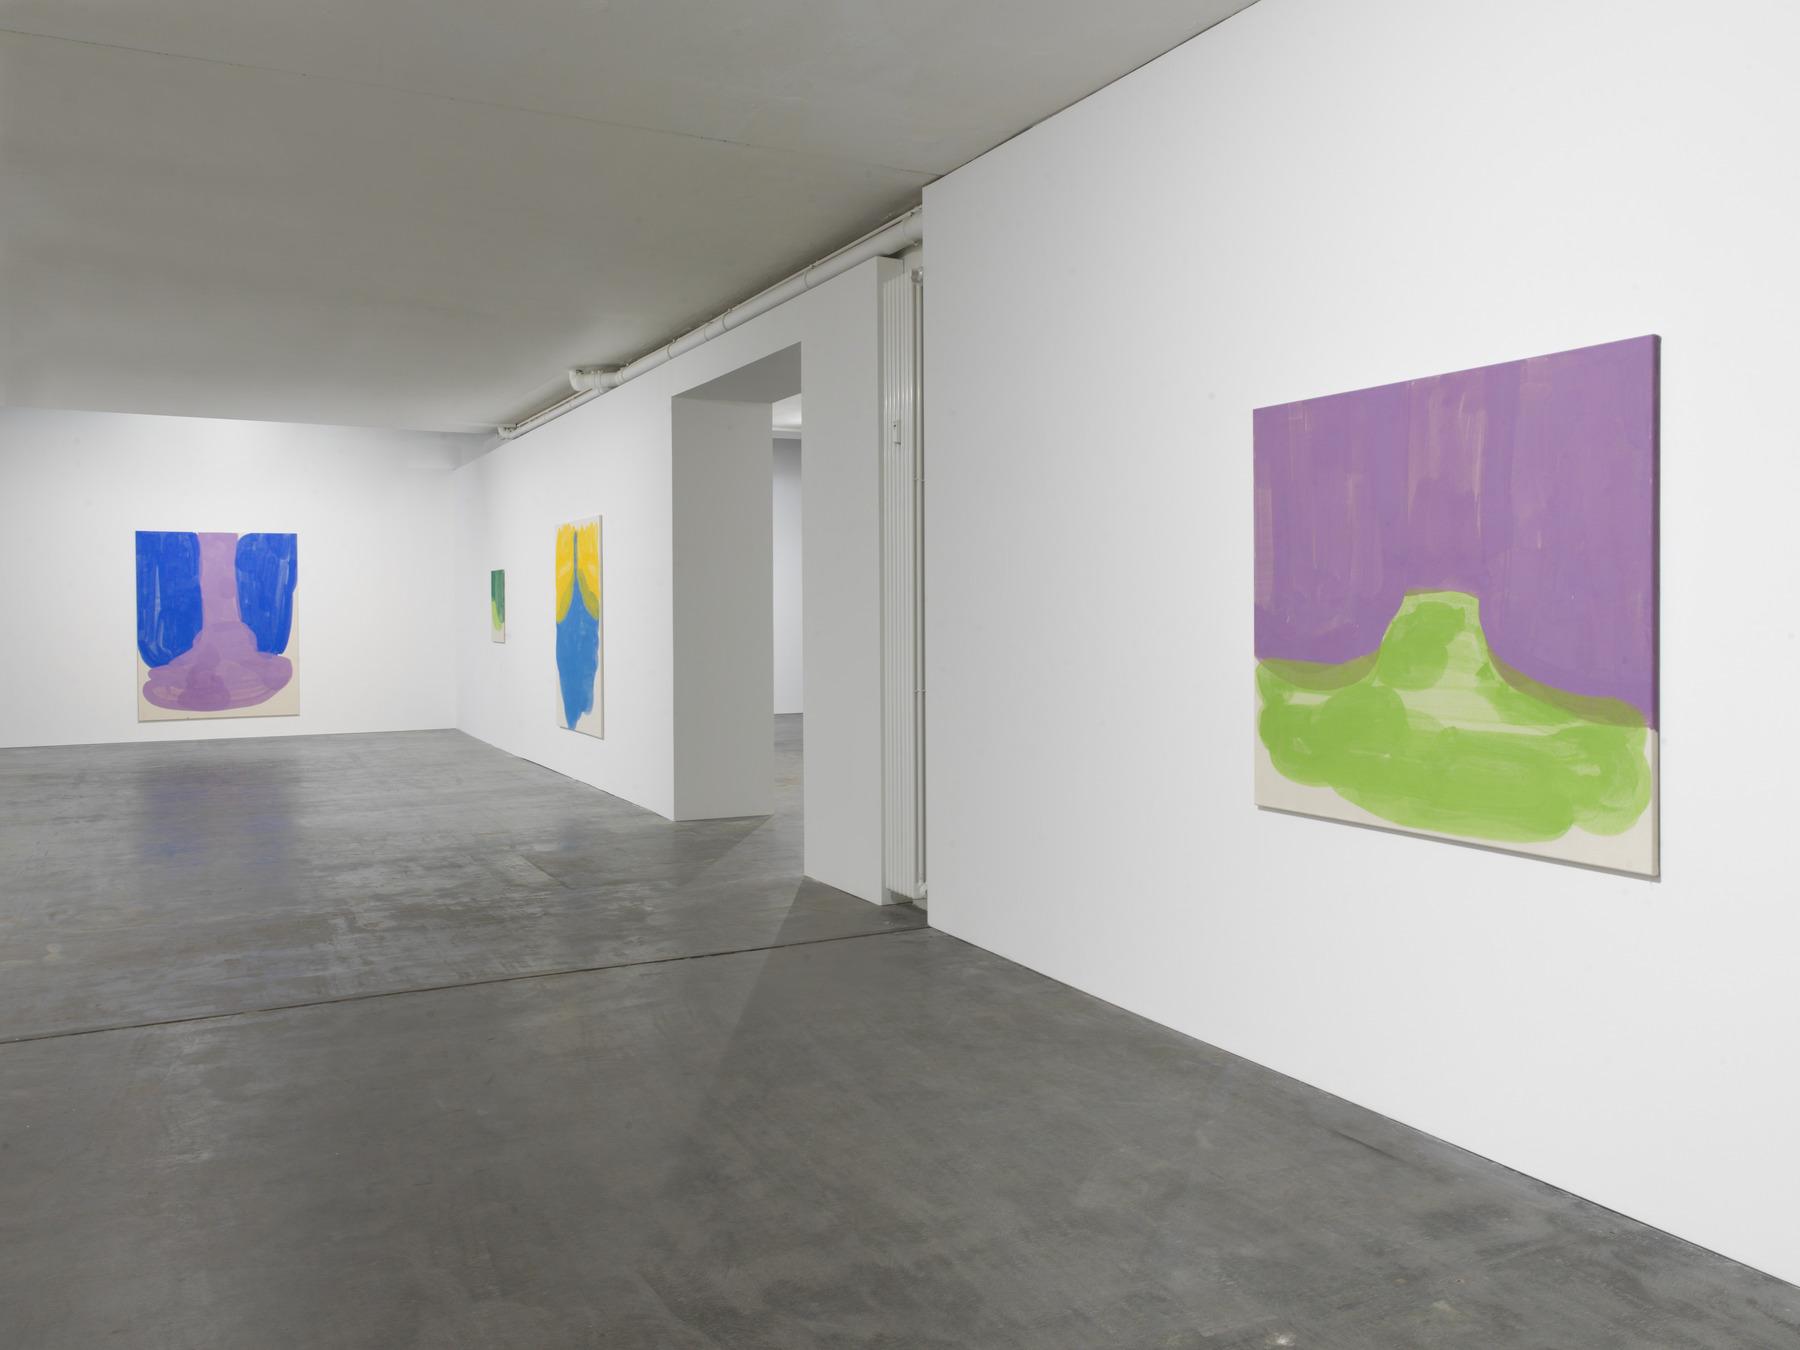 Tamina Amadyar_10,000 hours_Galerie Guido W. Baudach, Berlin_11